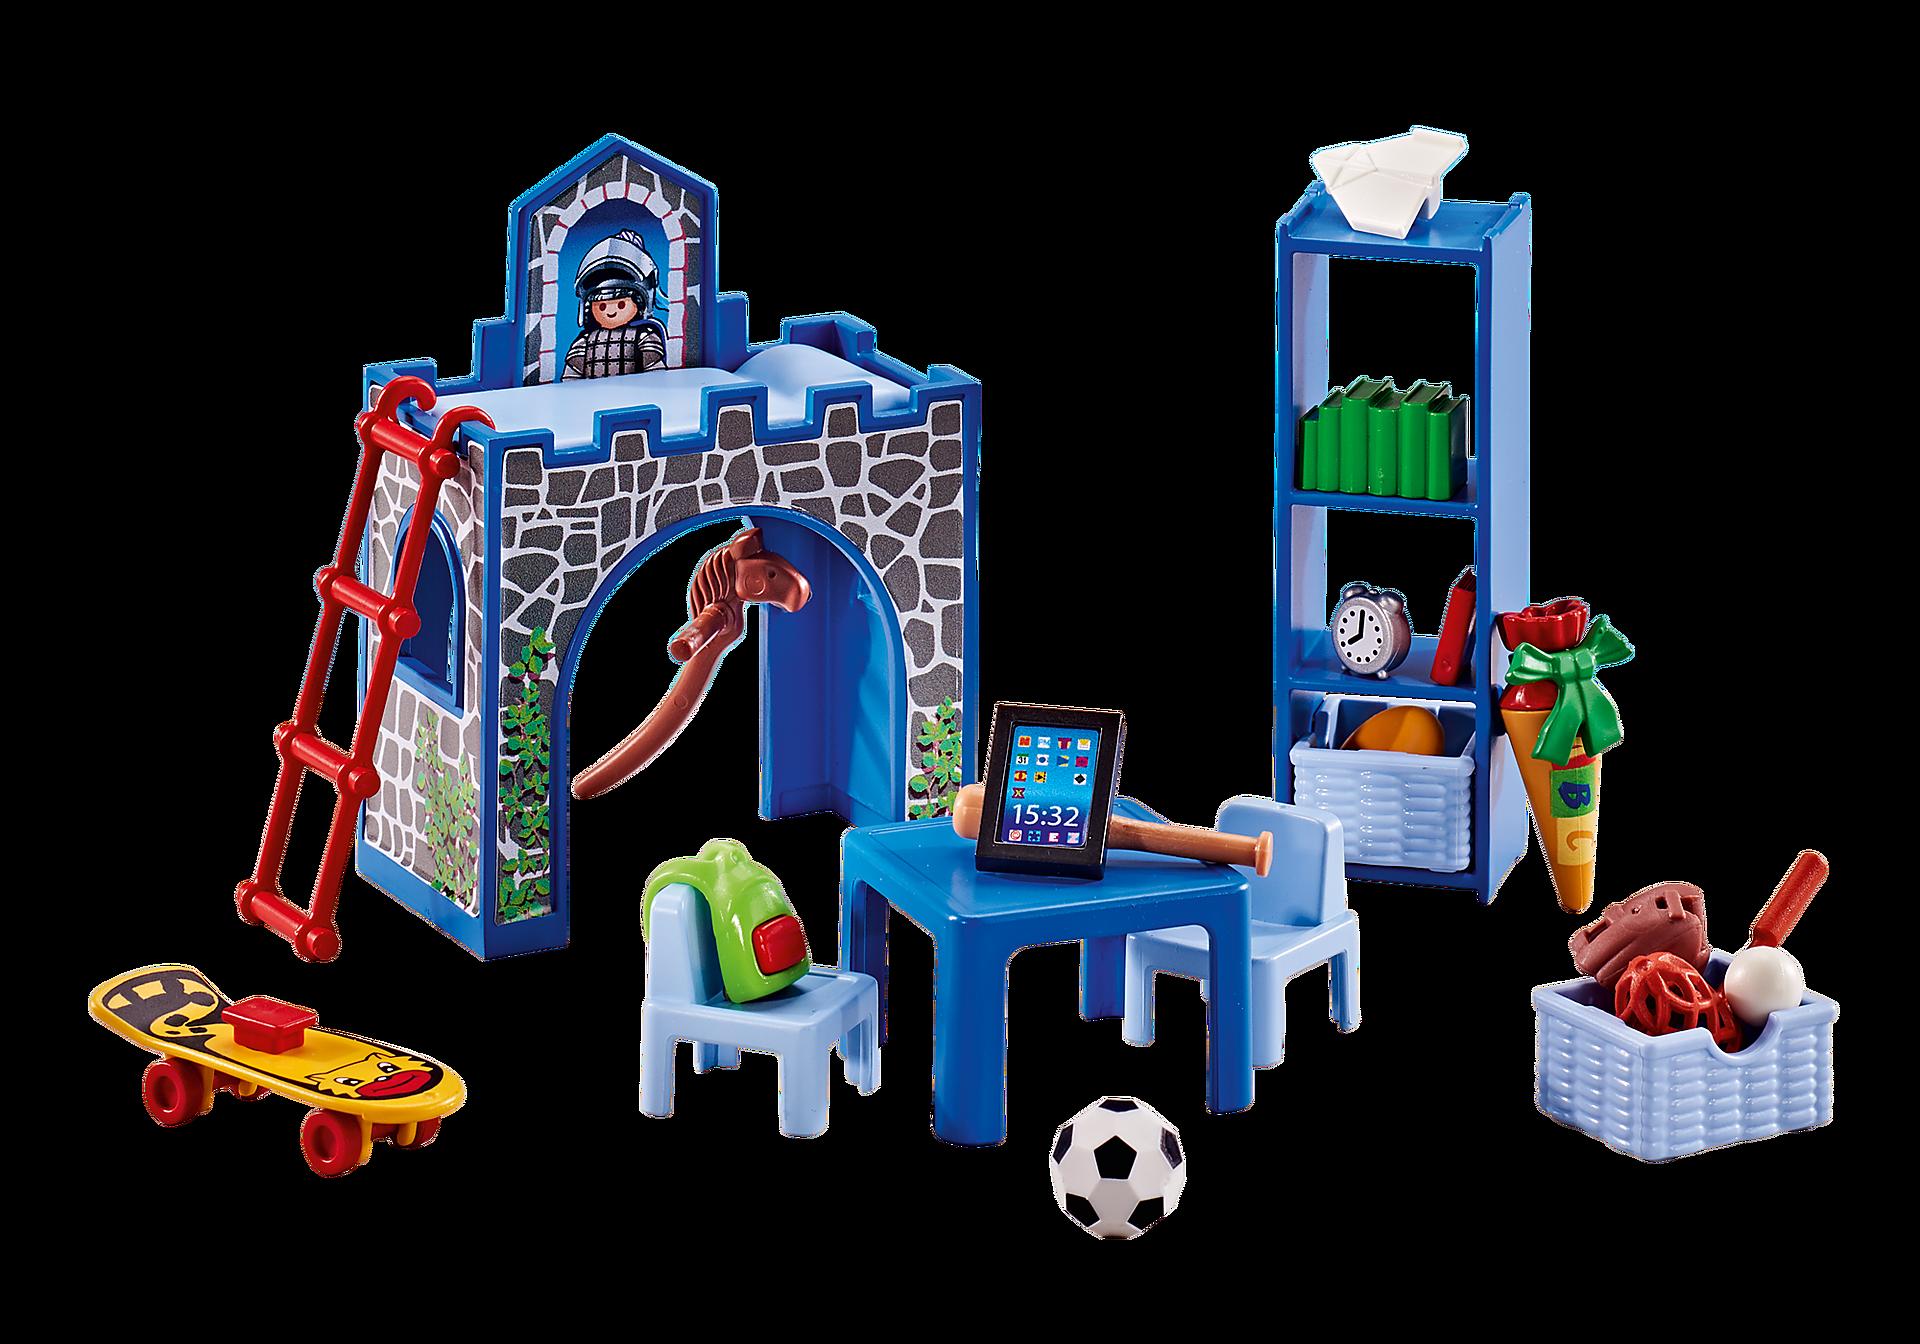 http://media.playmobil.com/i/playmobil/6556_product_detail/Habitación infantil